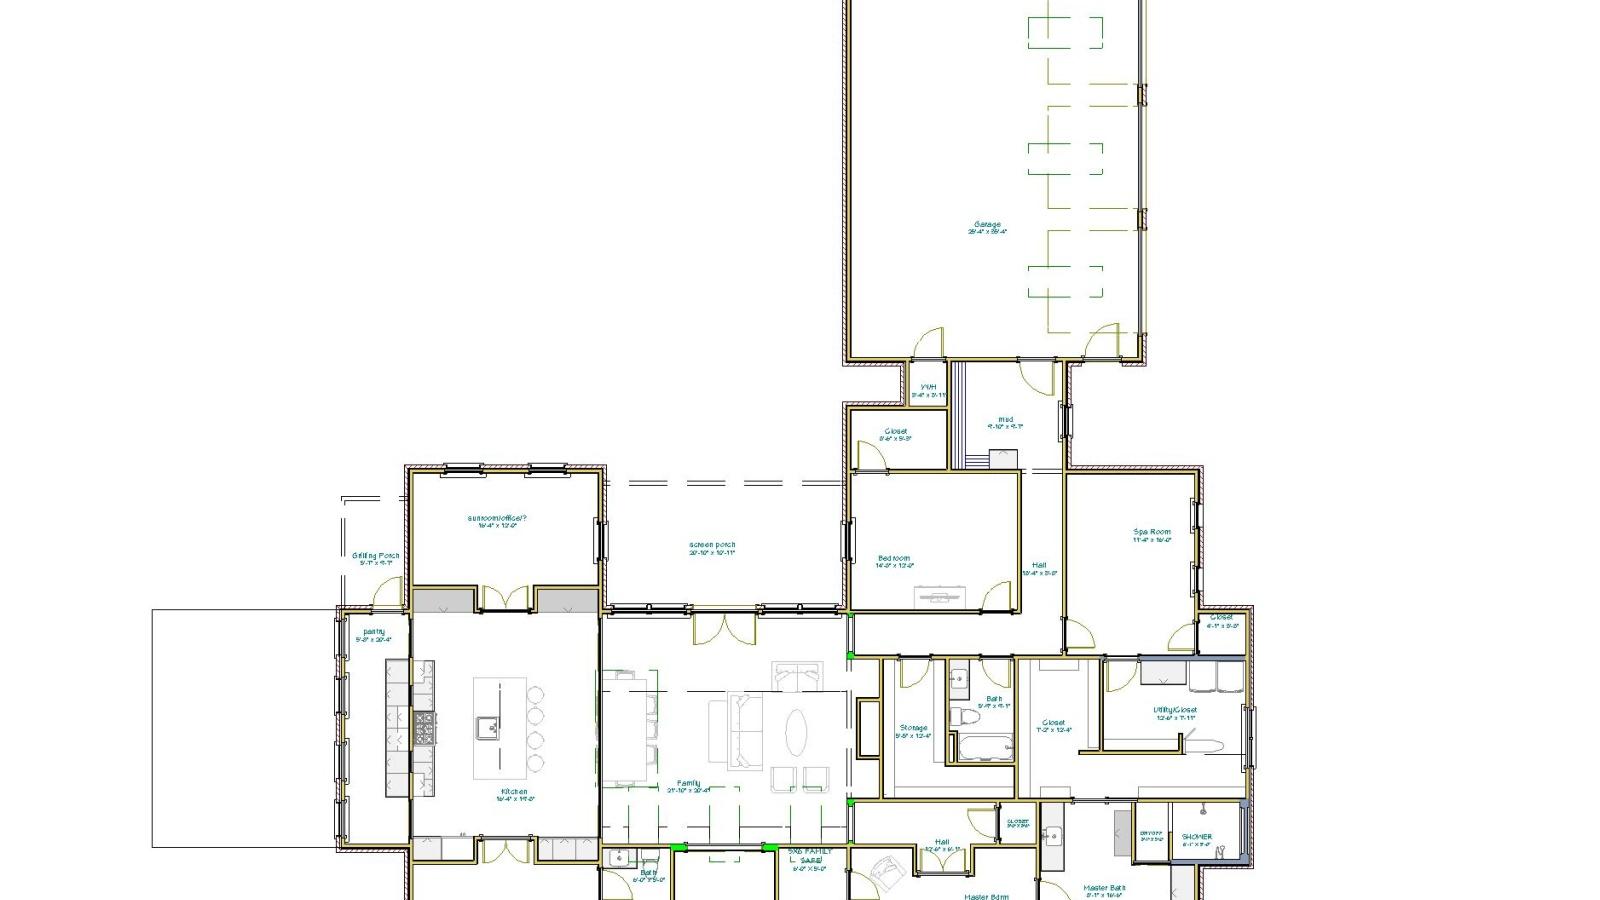 3 Bedrooms Bedrooms, ,3 BathroomsBathrooms,Custom Home,Home Plans,1045